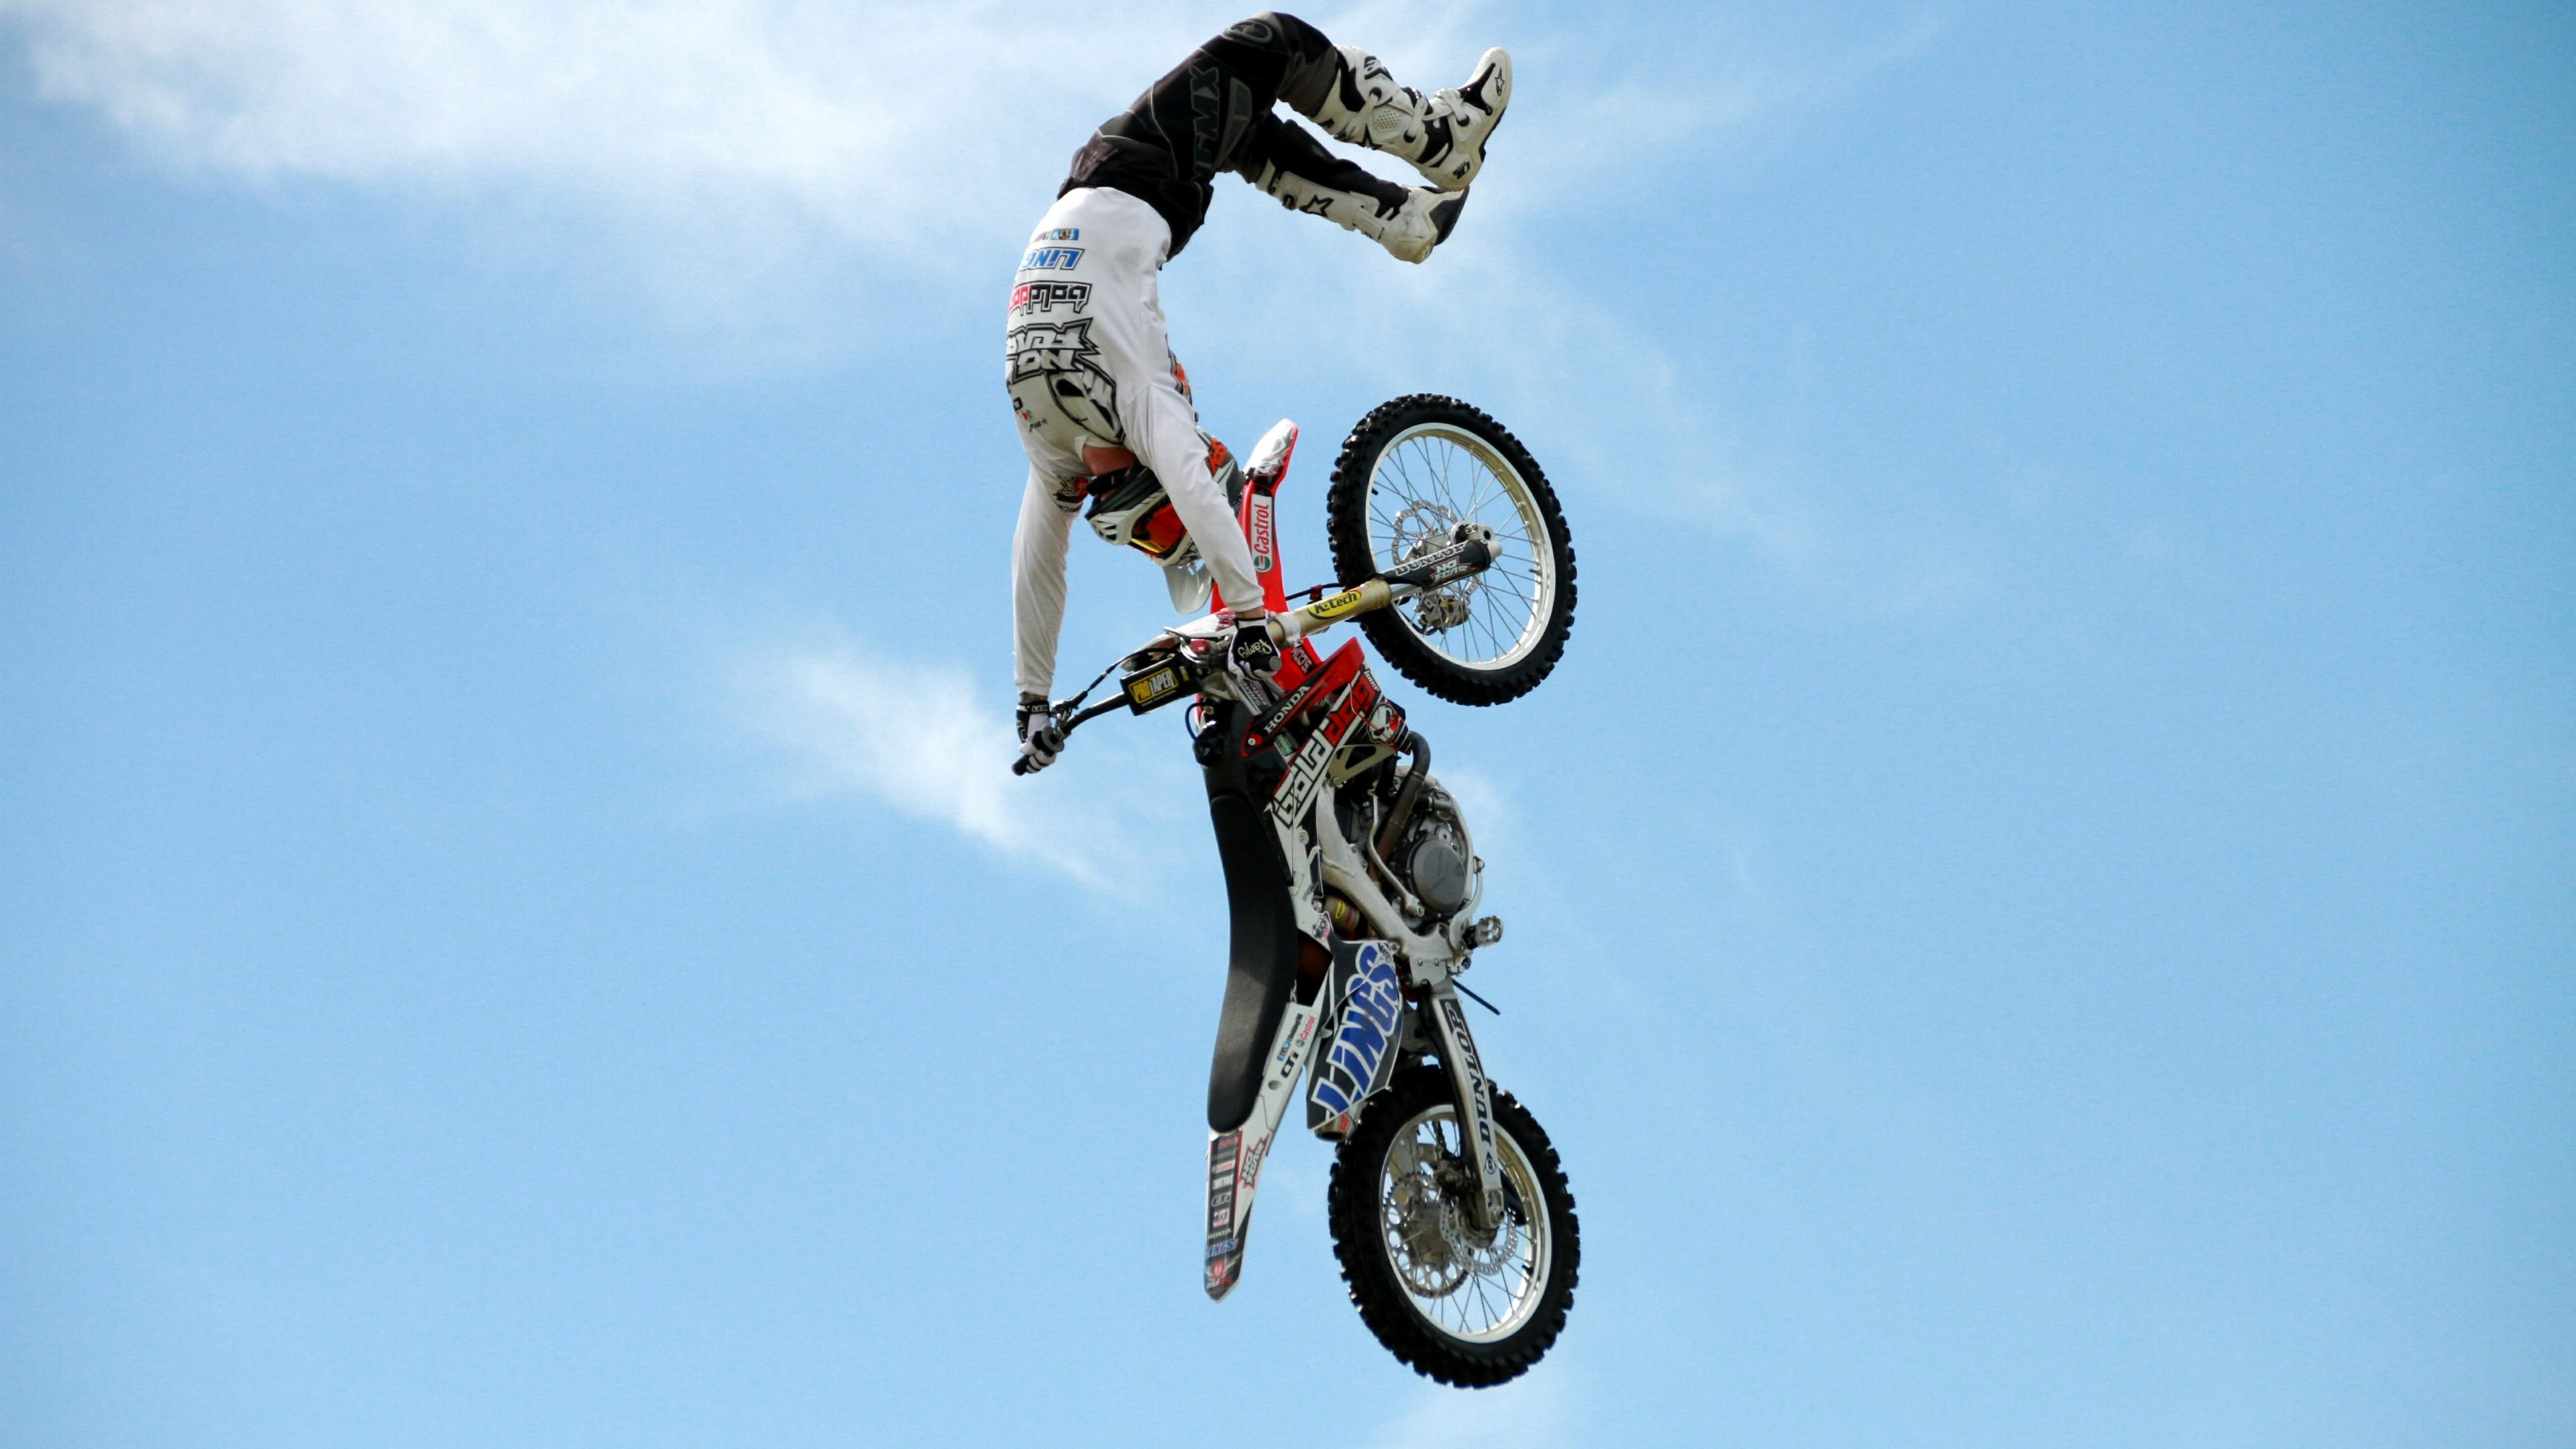 wallpaper motocross fmx rider freestyle maneuver